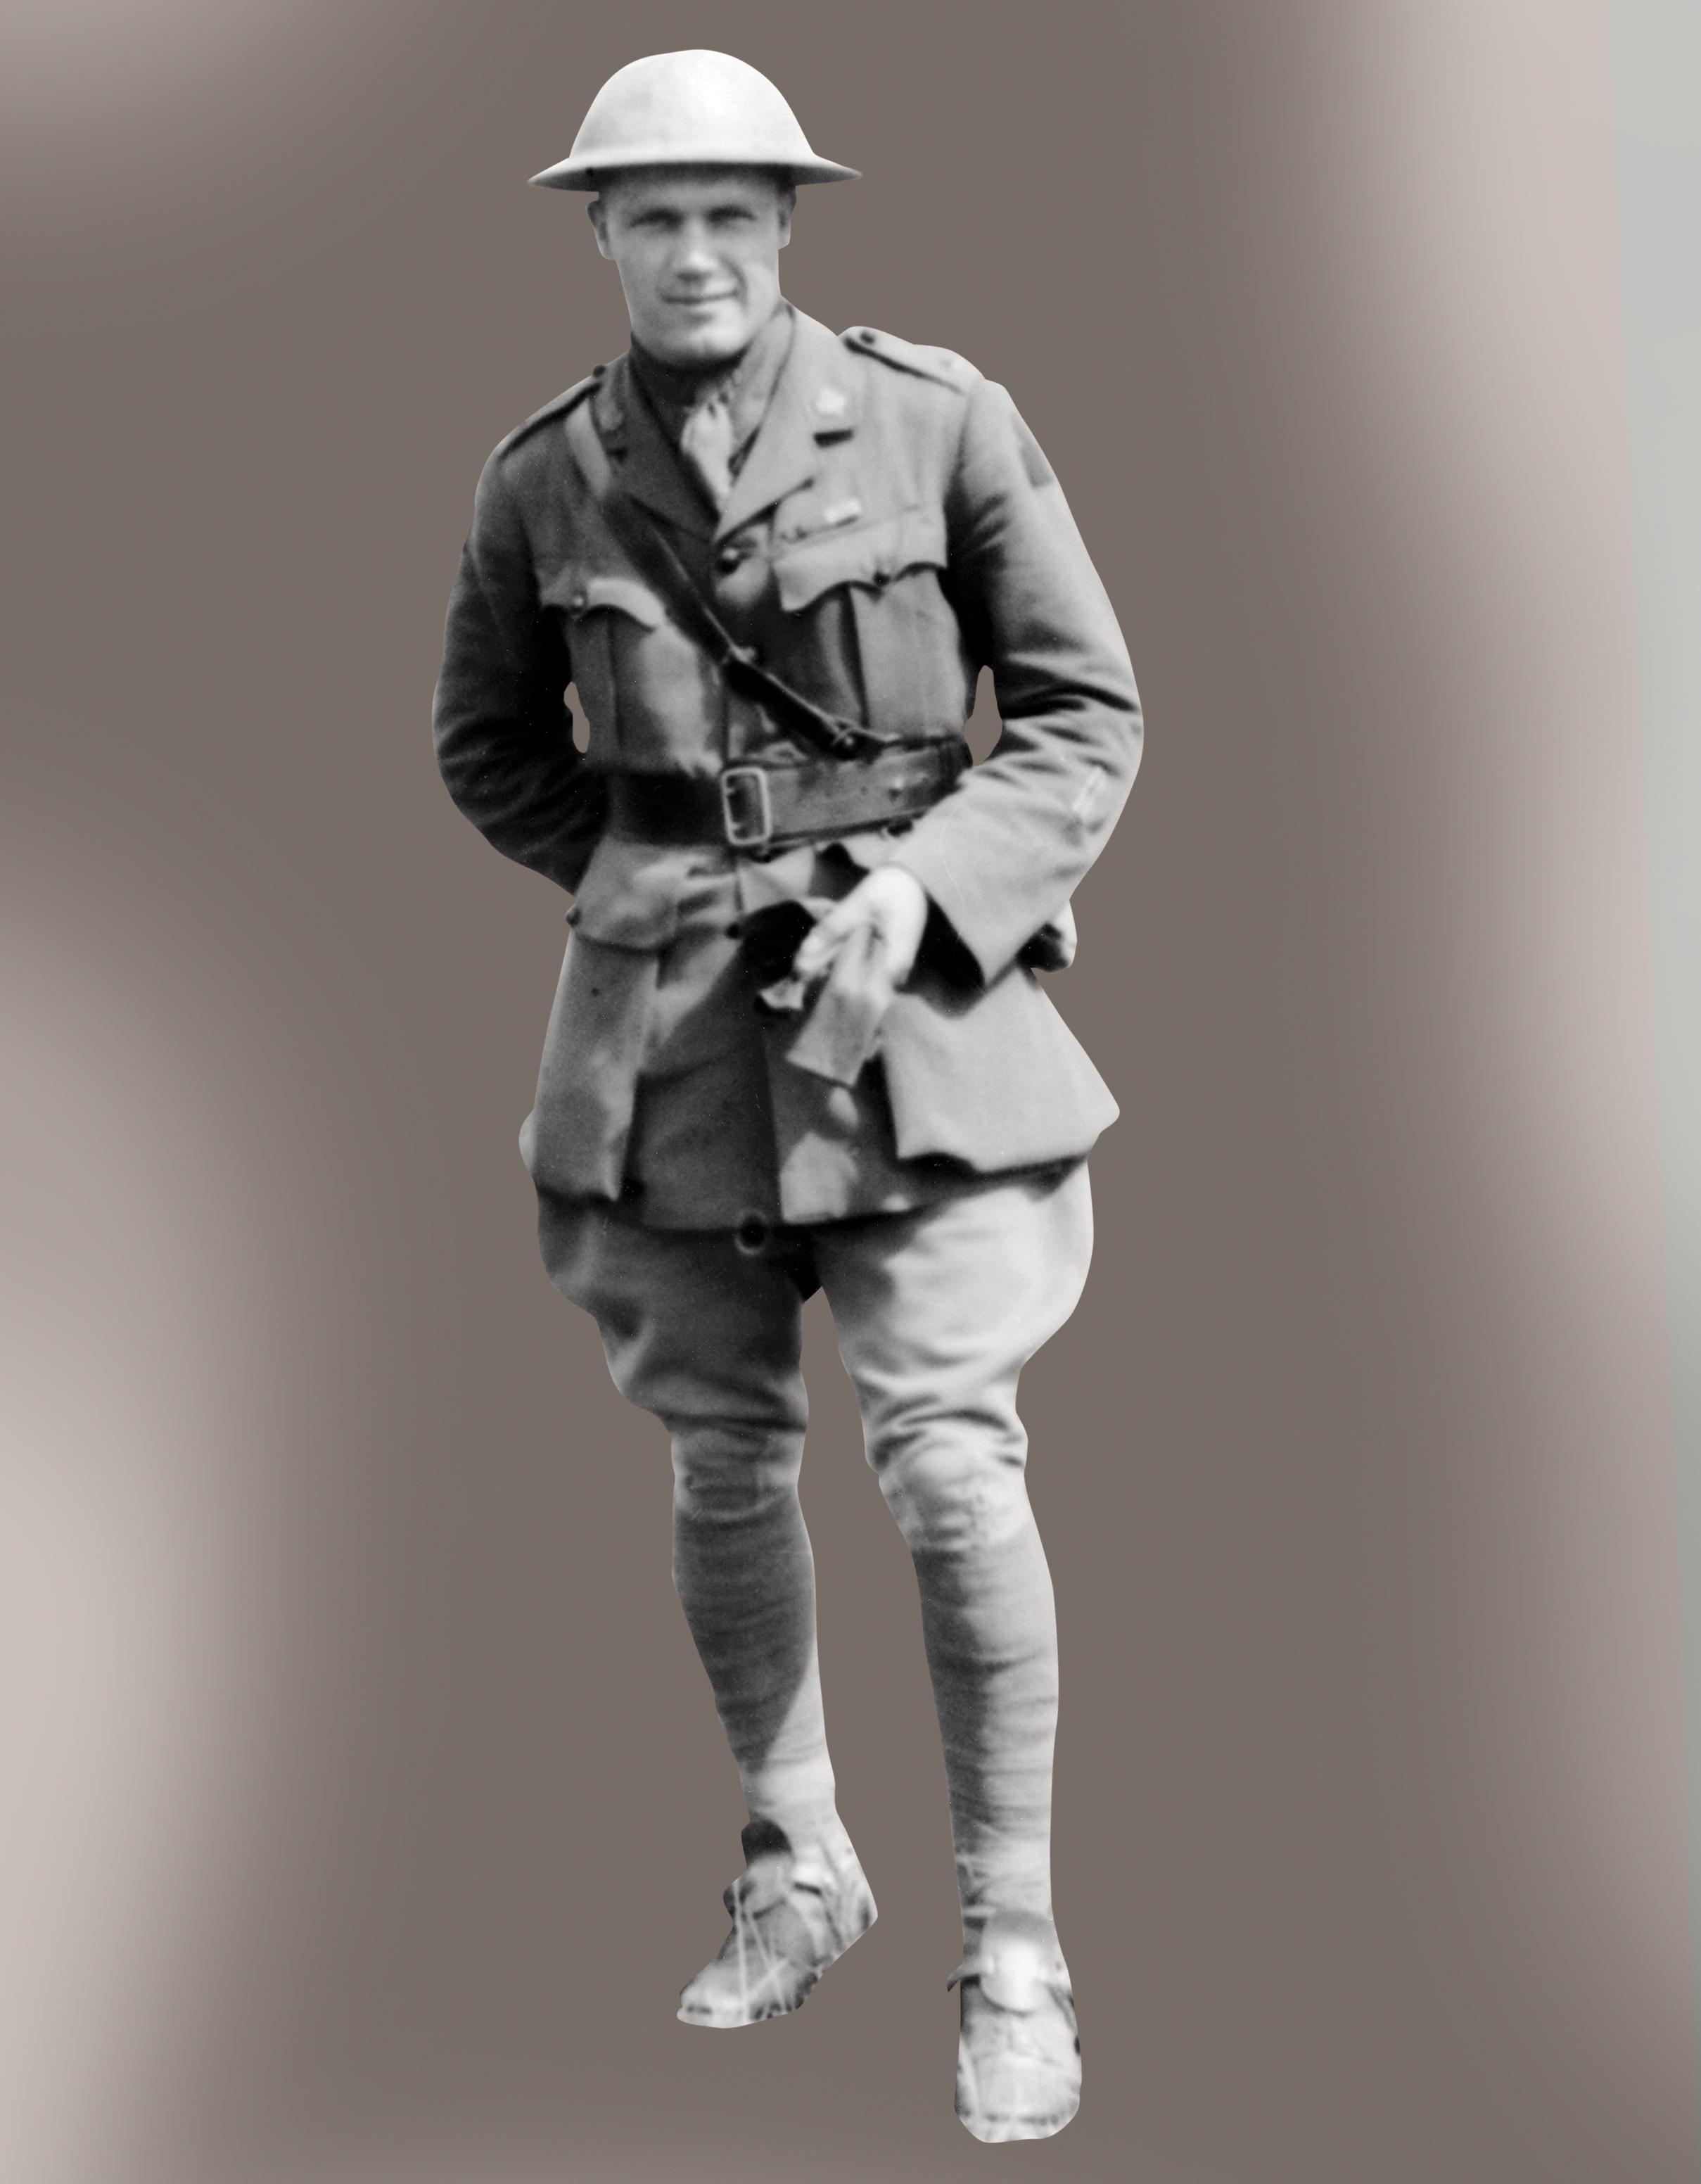 Historic Victoria Cross Photo – Major Thain MacDowell